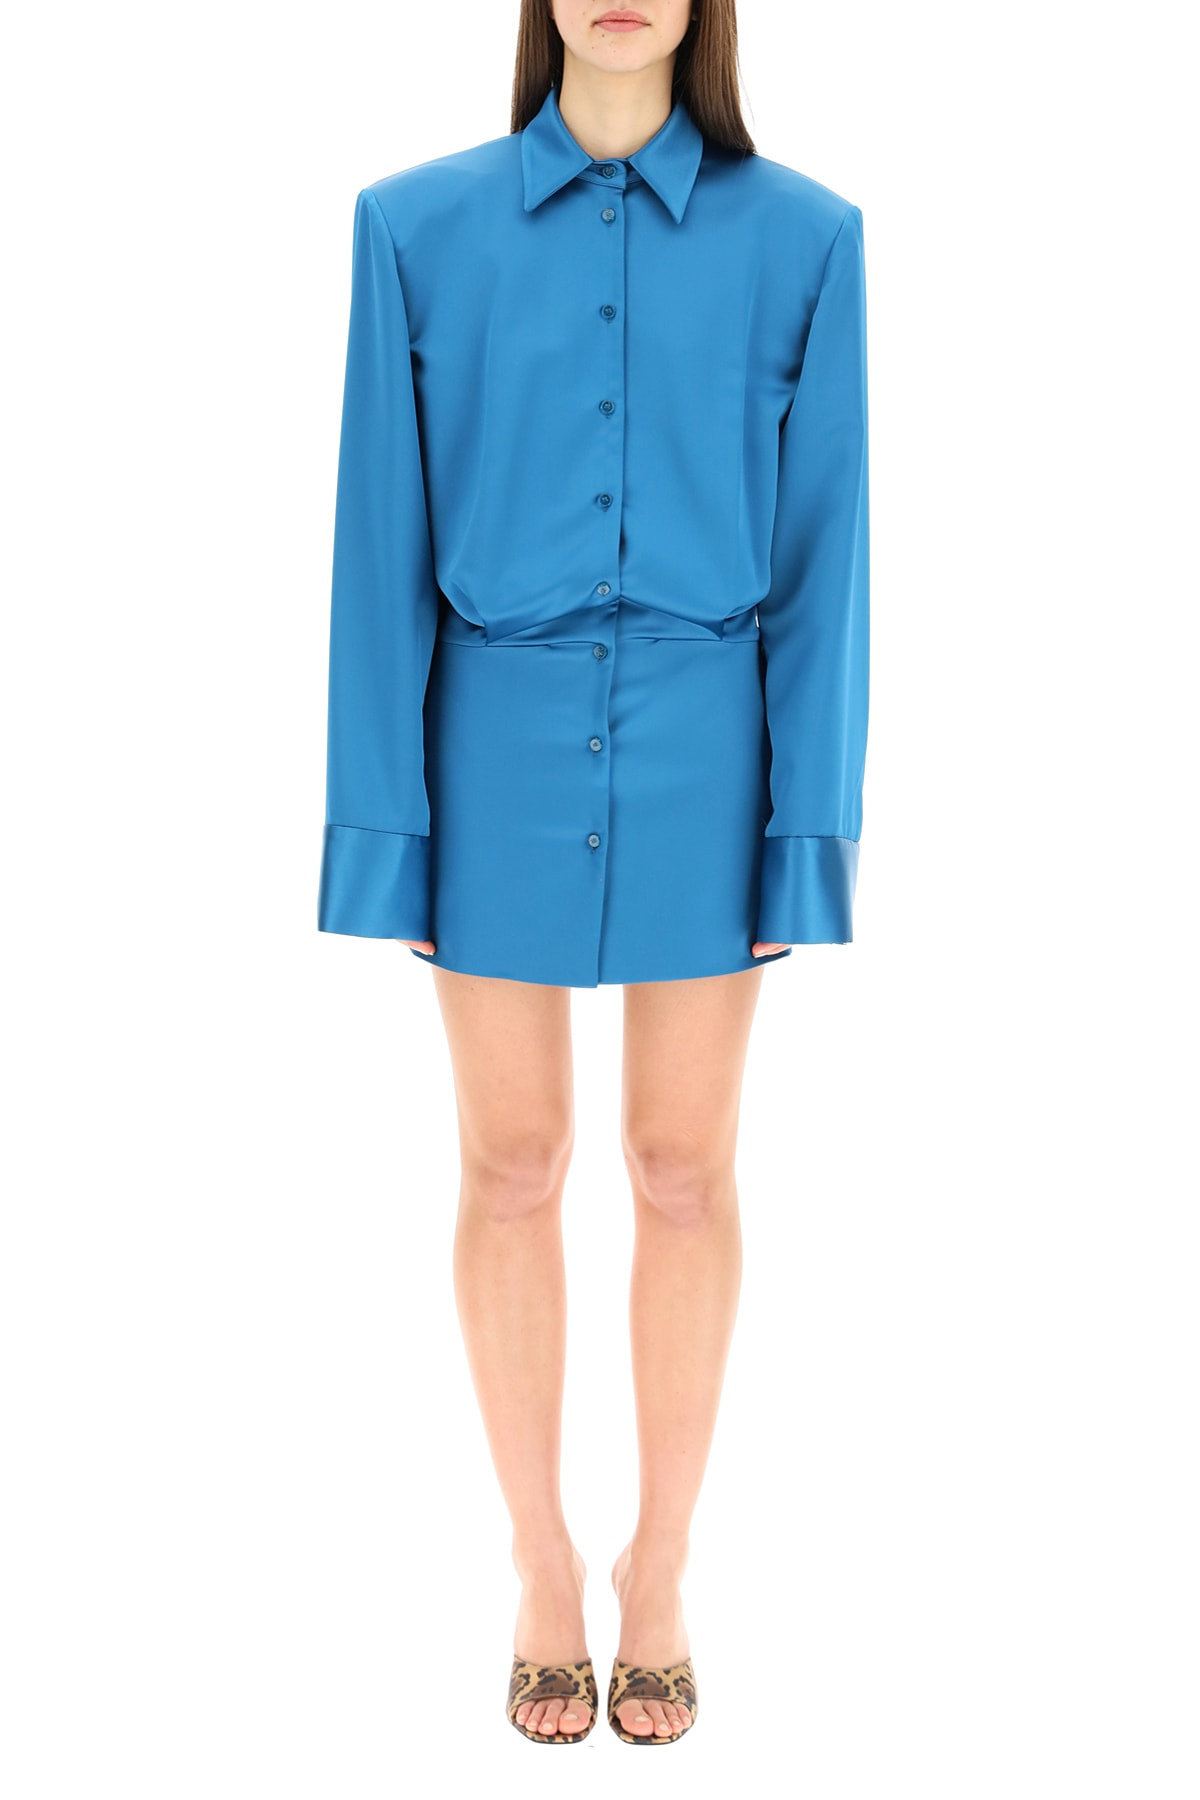 Attico Mini dresses MARGOT MINI SHIRT DRESS